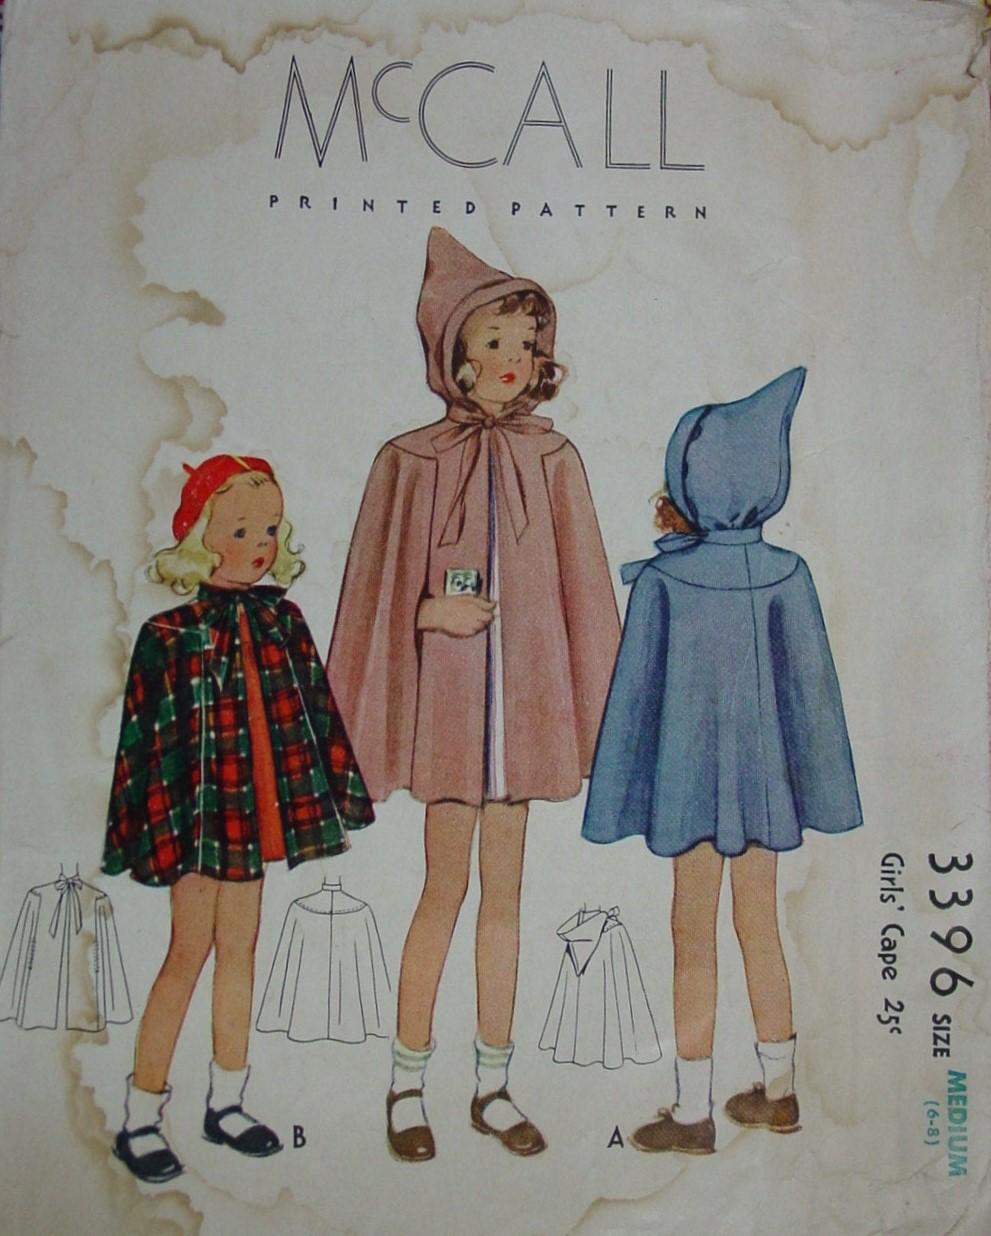 McCall 3396